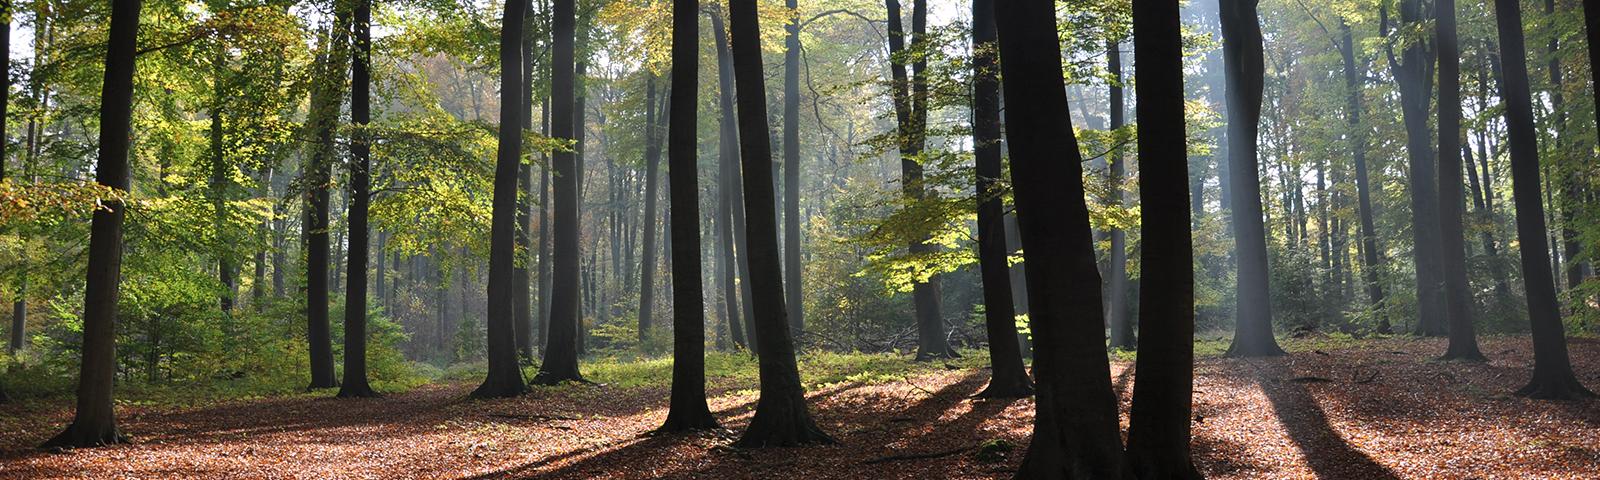 Wandern im Naturpark Barnim